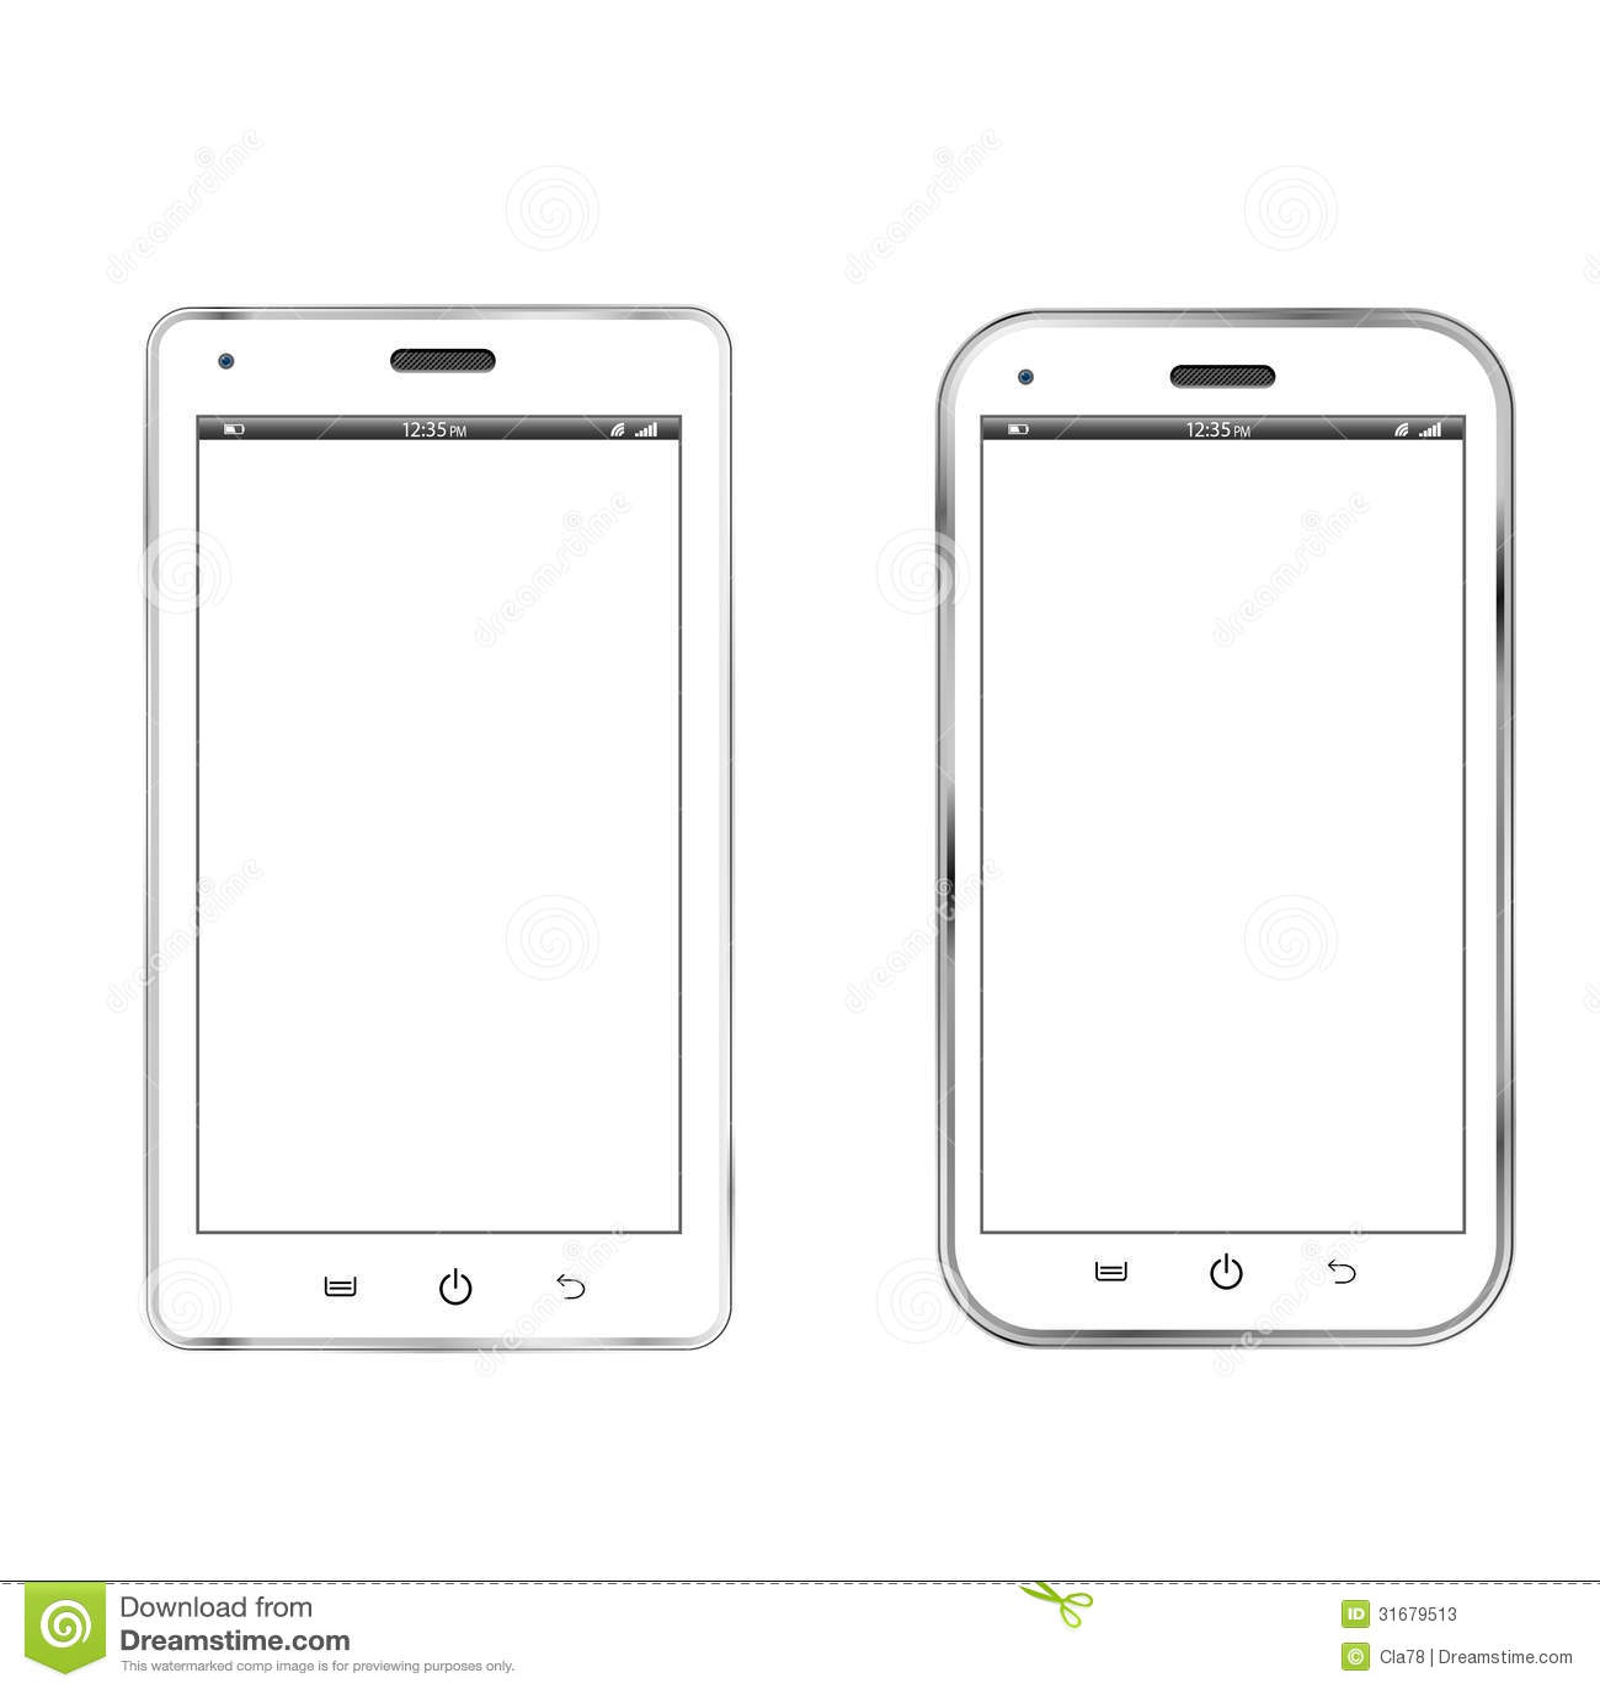 vender iphone 5 libre